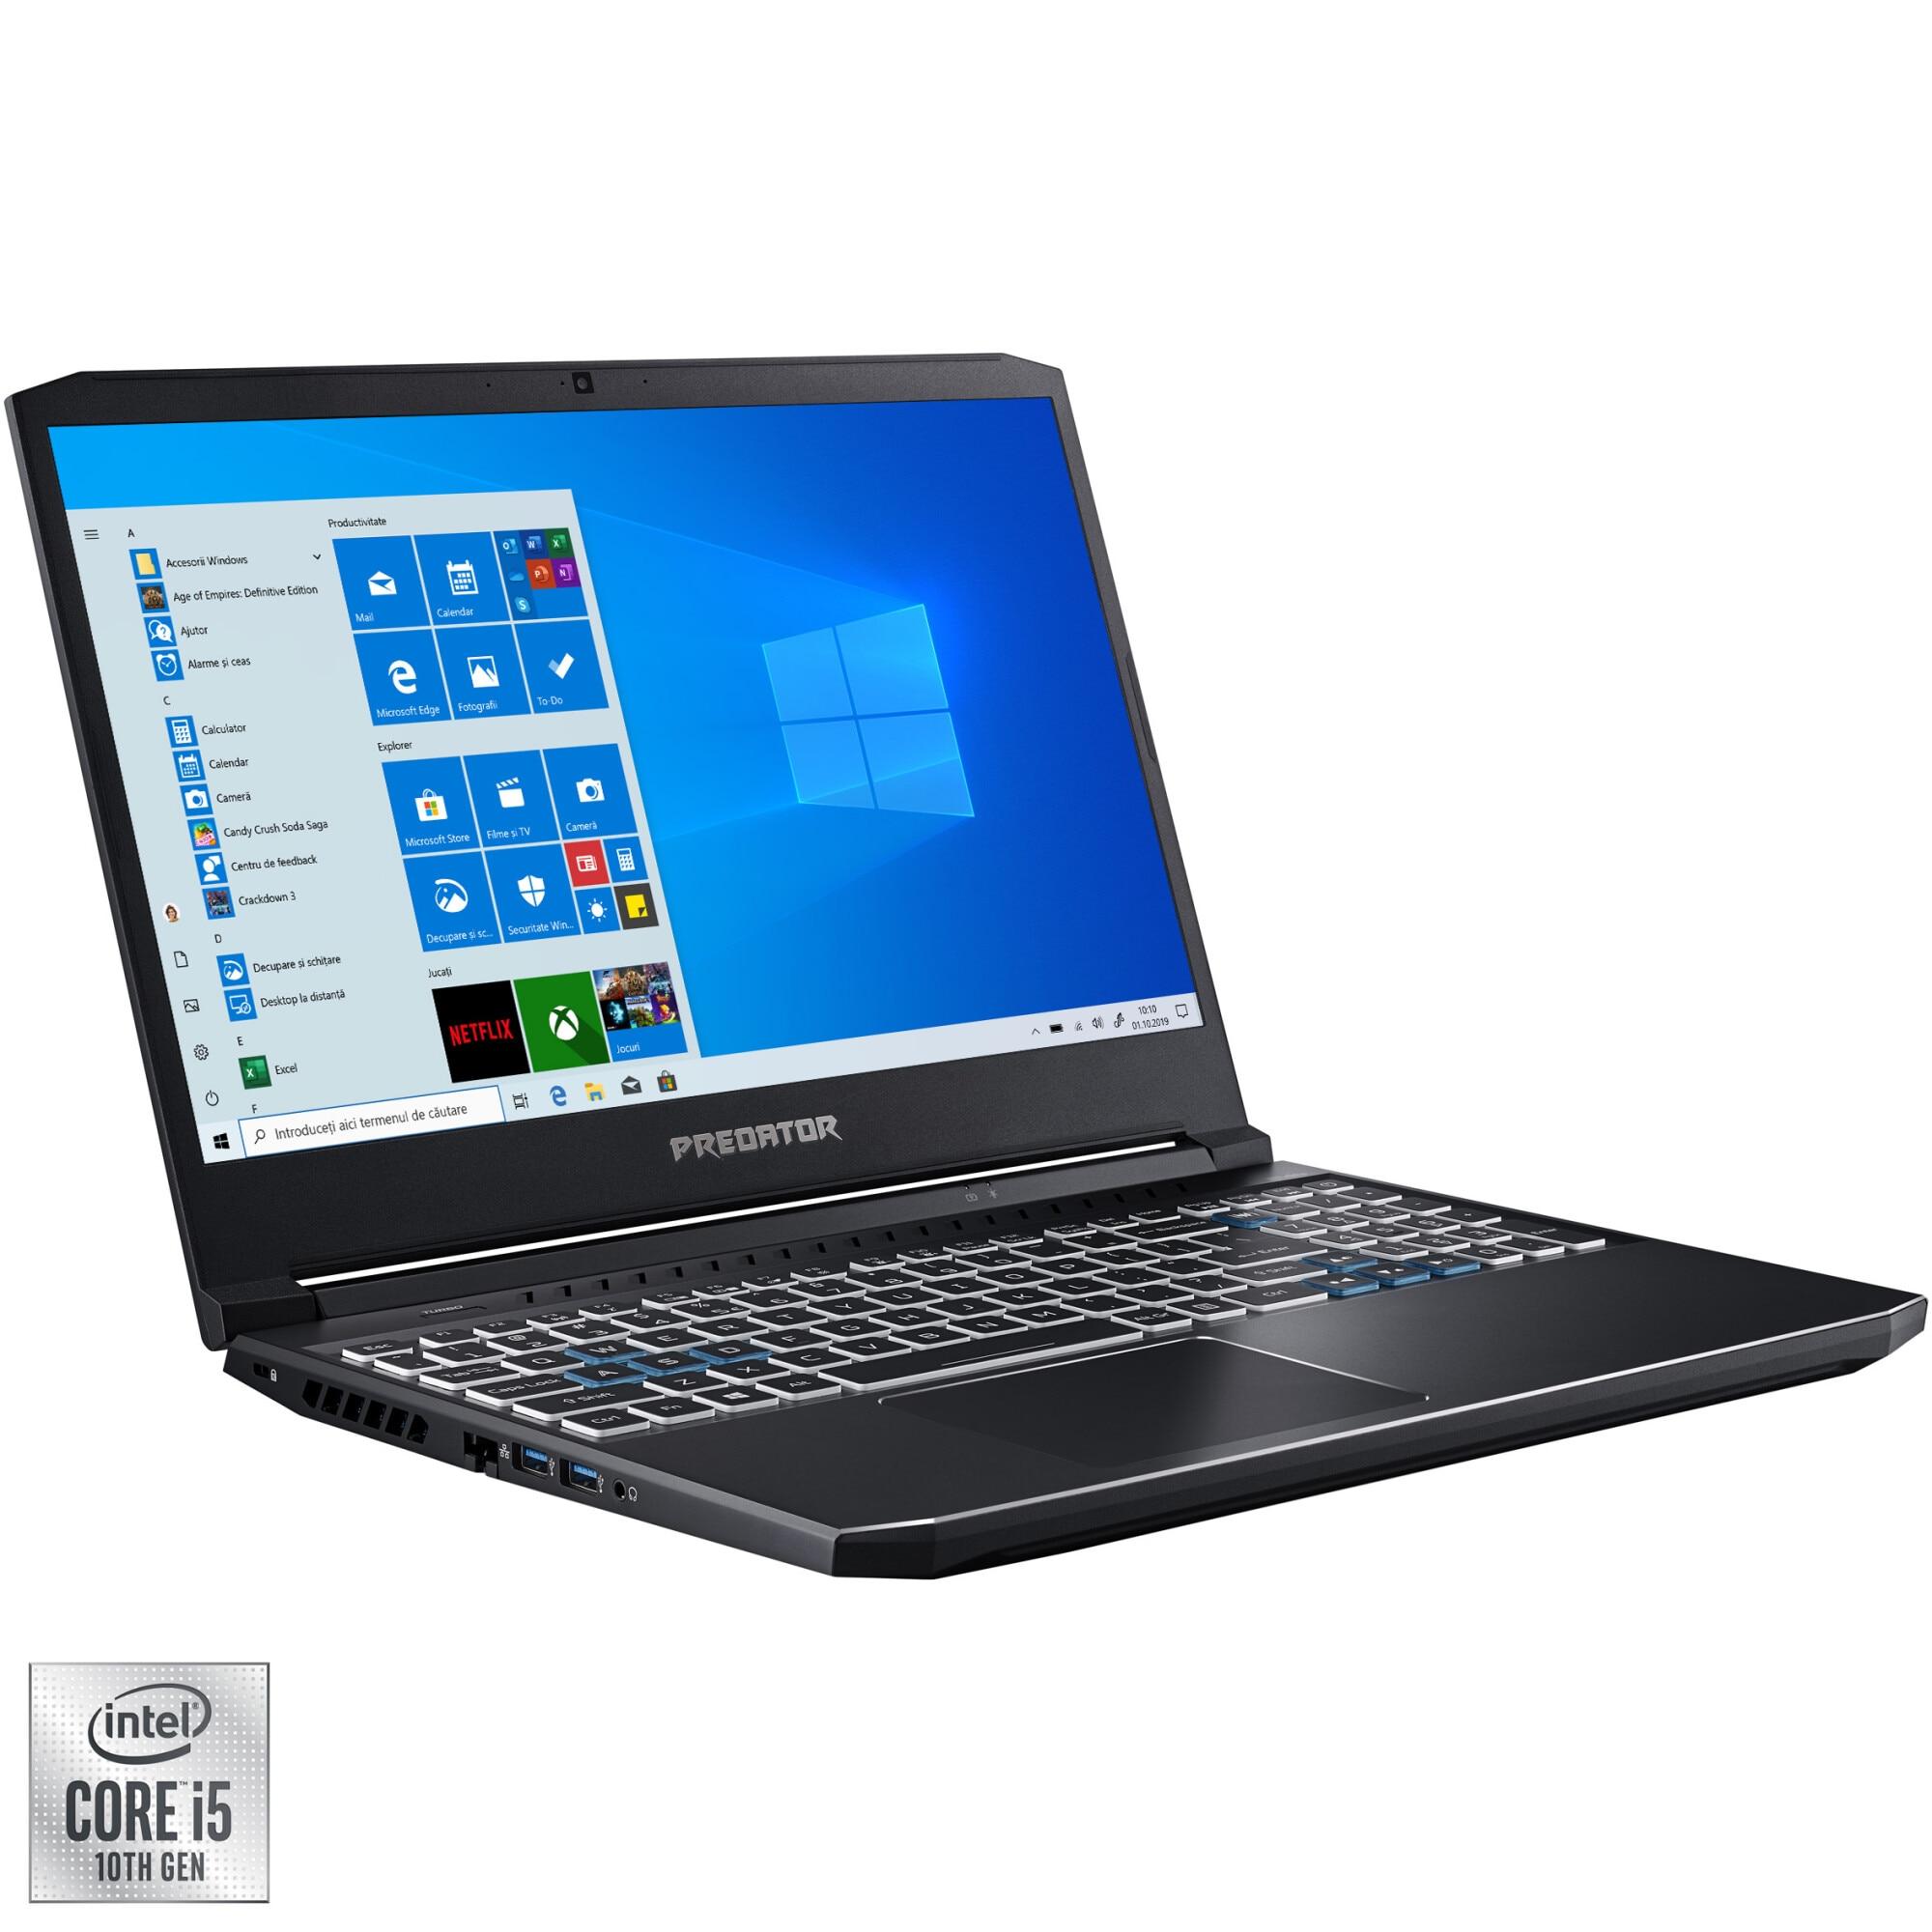 "Fotografie Laptop Gaming Acer Predator Helios 300 PH315-53 cu procesor Intel Core i5-10300H pana la 4.50 GHz, 15.6"", Full HD, 144Hz, 16GB, 256GB SSD, NVIDIA GeForce RTX2060 6GB, Windows 10 Home, Black"